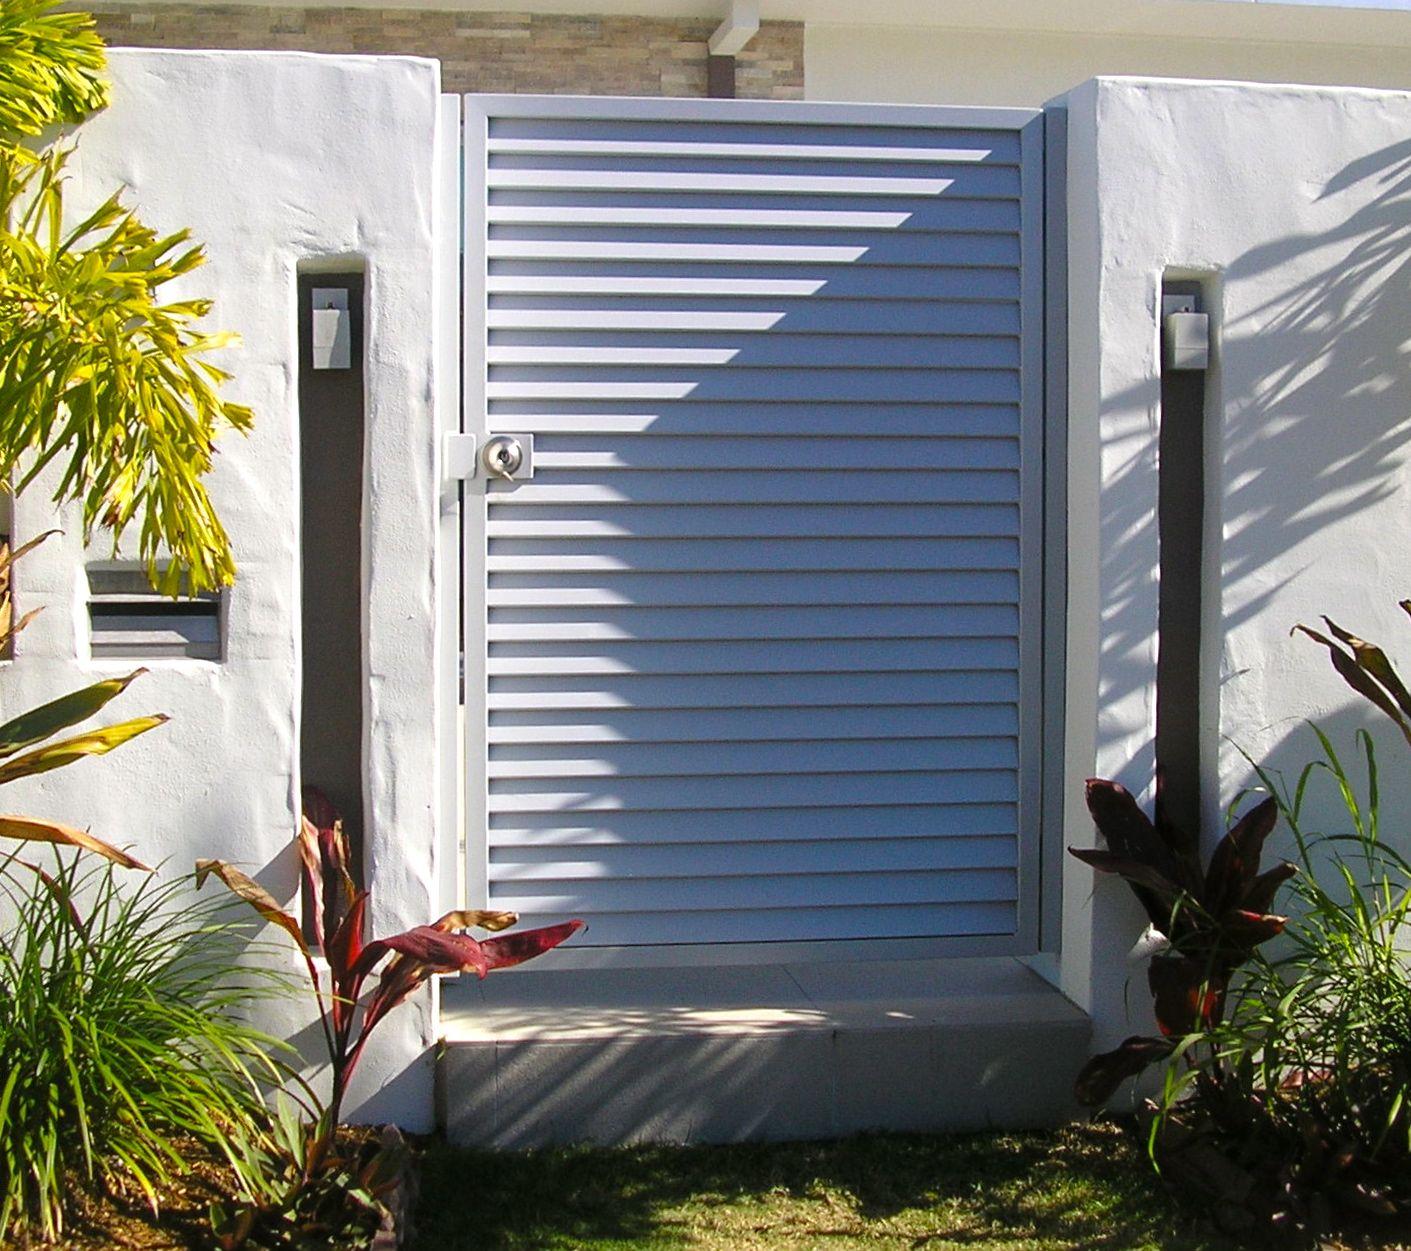 Pool Fencing Gold Coast Glass Pool Fencing Flat Top Pool Fencing Gates Sliding Gates Balustrades Fence Panels Pool Fence Fencing Gates Outdoor Doors